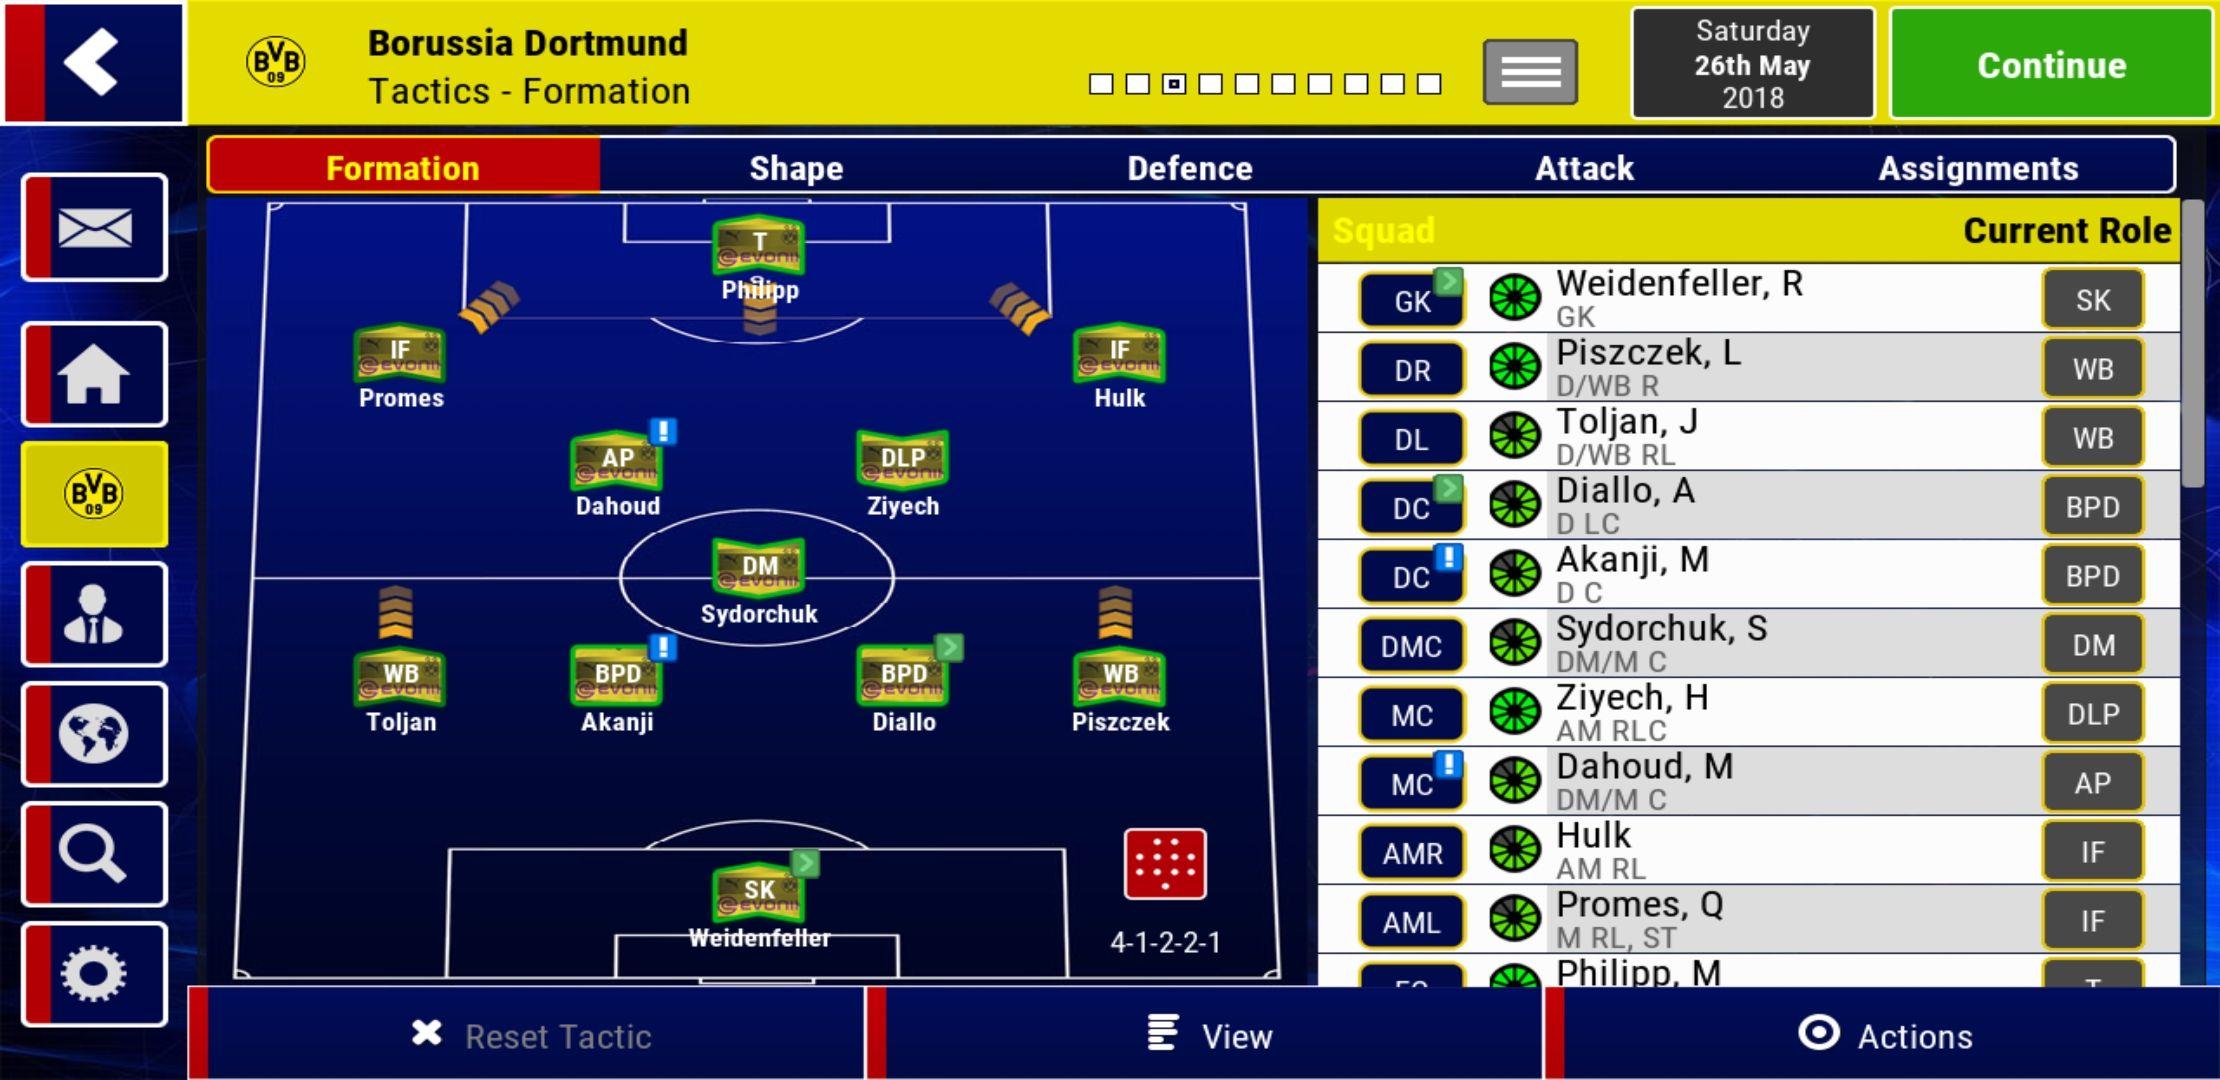 Borussia Dortmund FC - Can they Win the Bundesliga